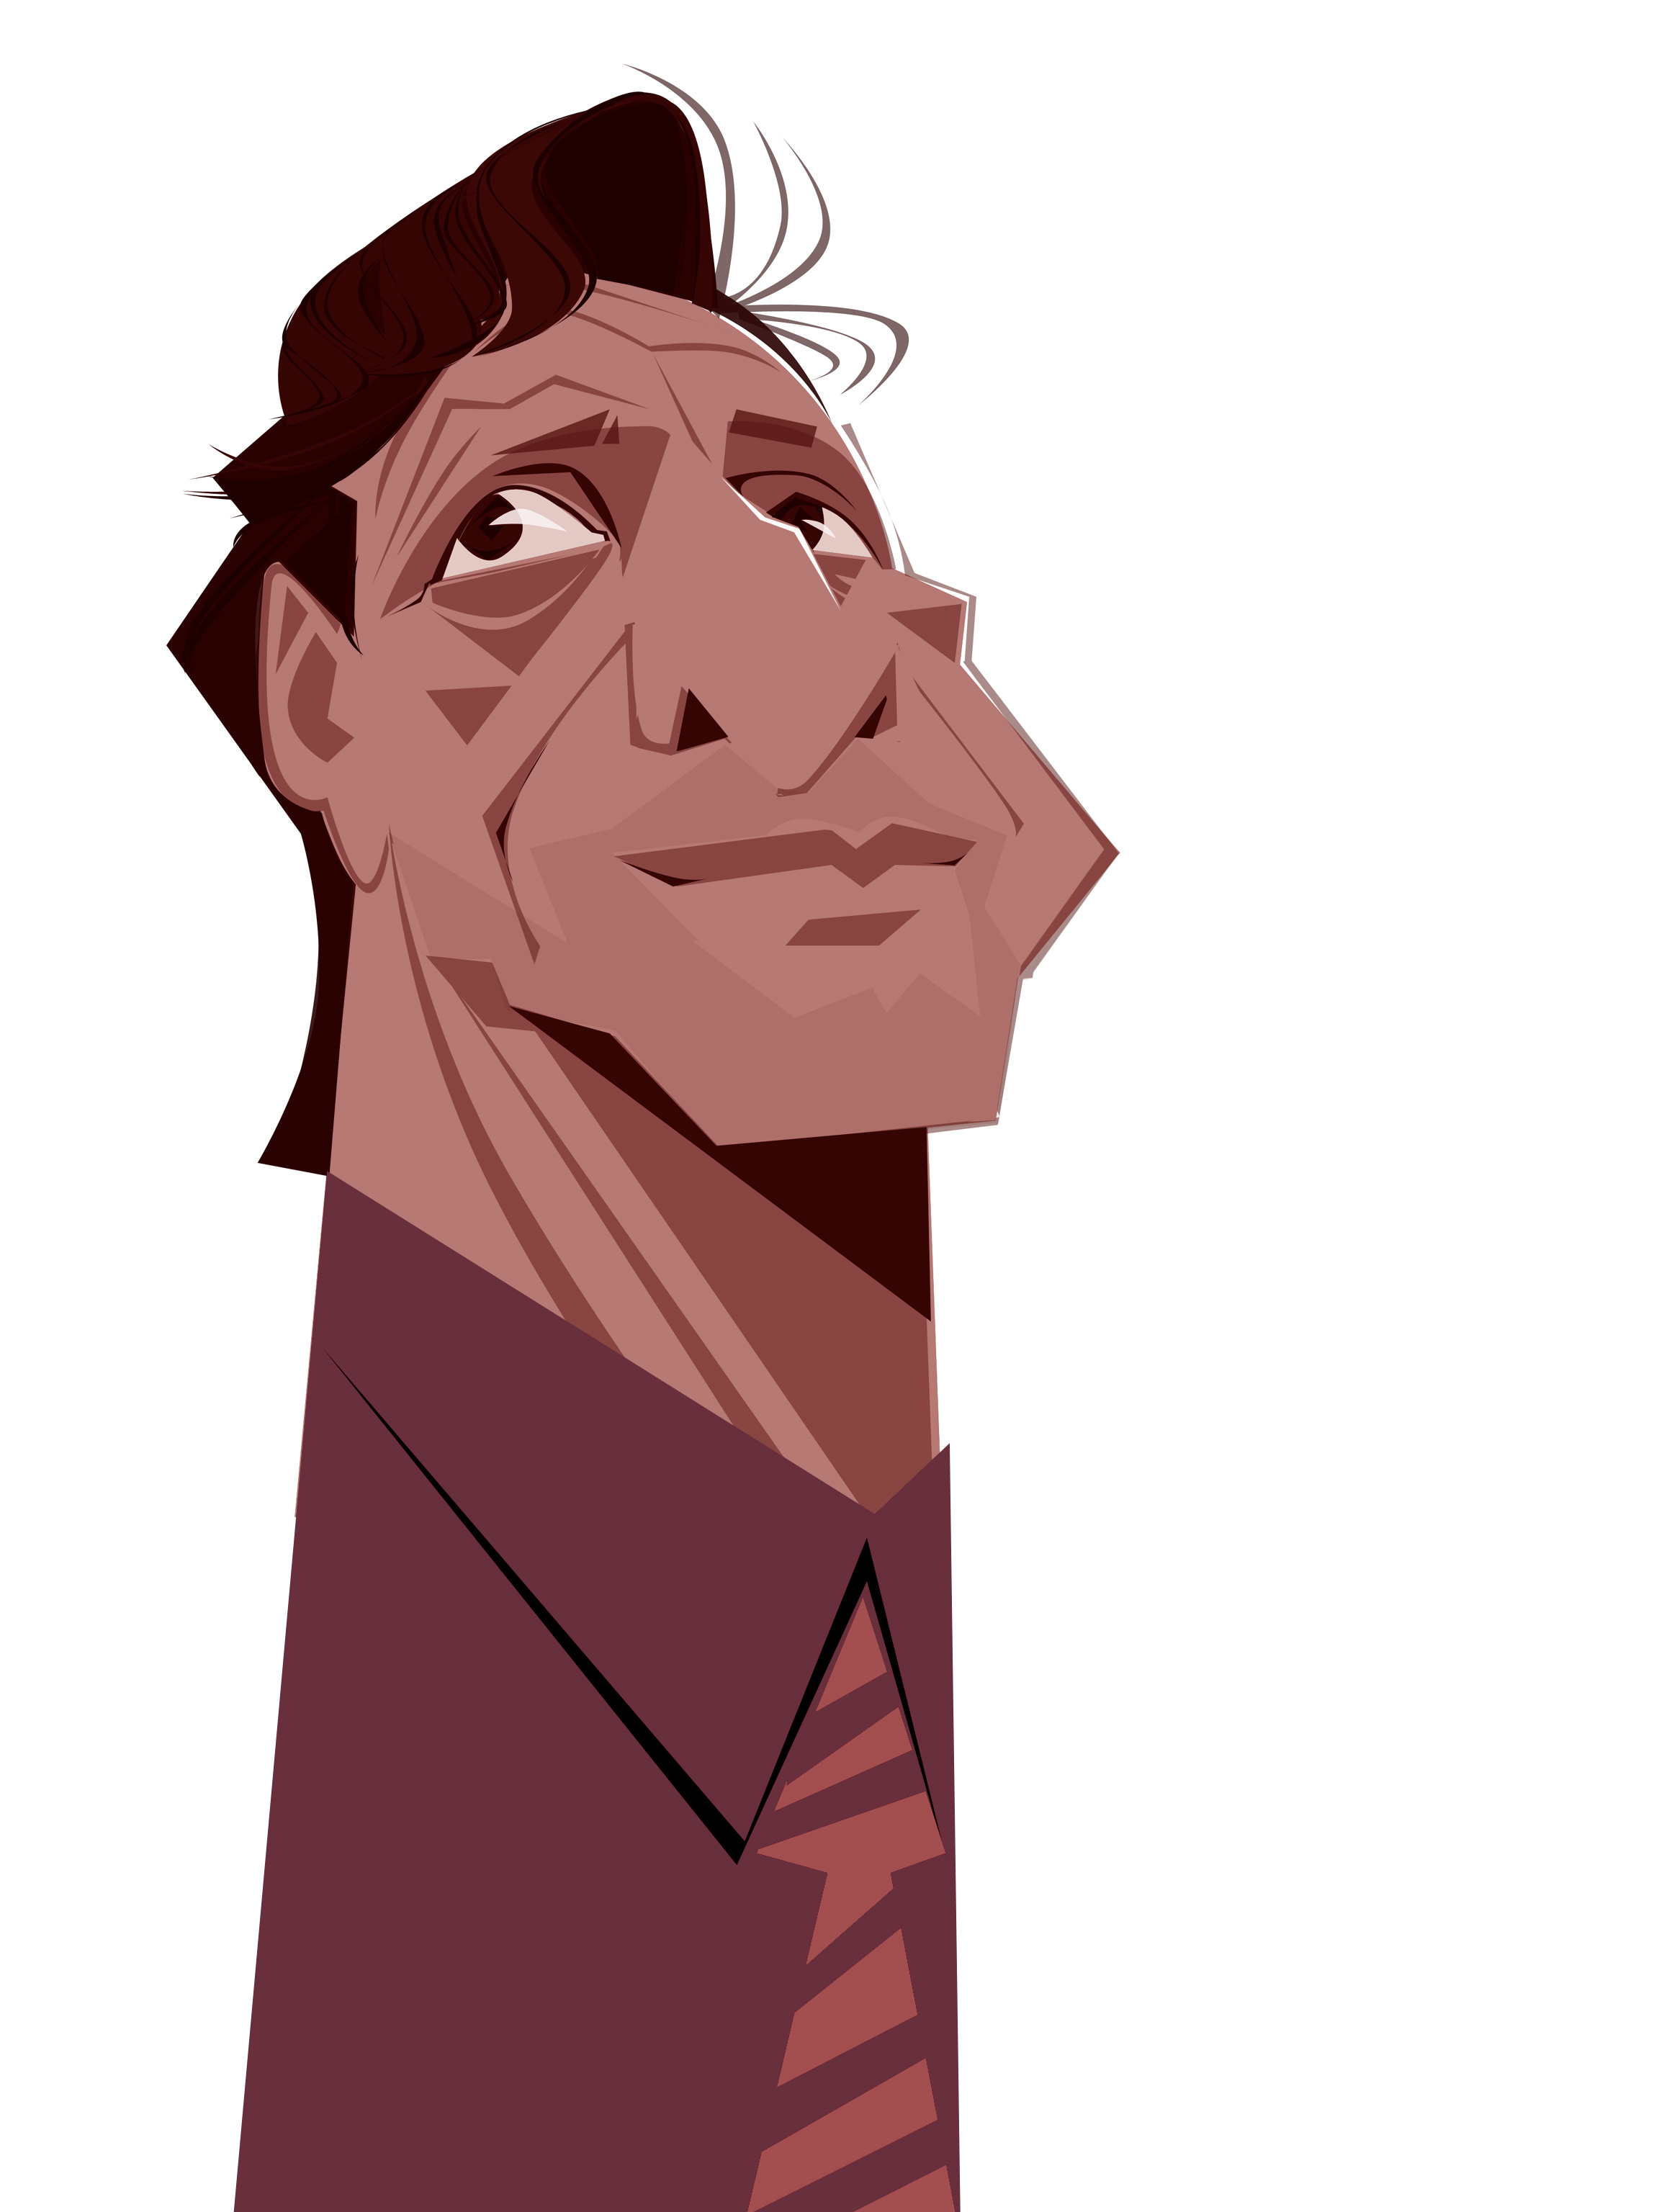 Johan Cruyff-digital sketches Showflipper